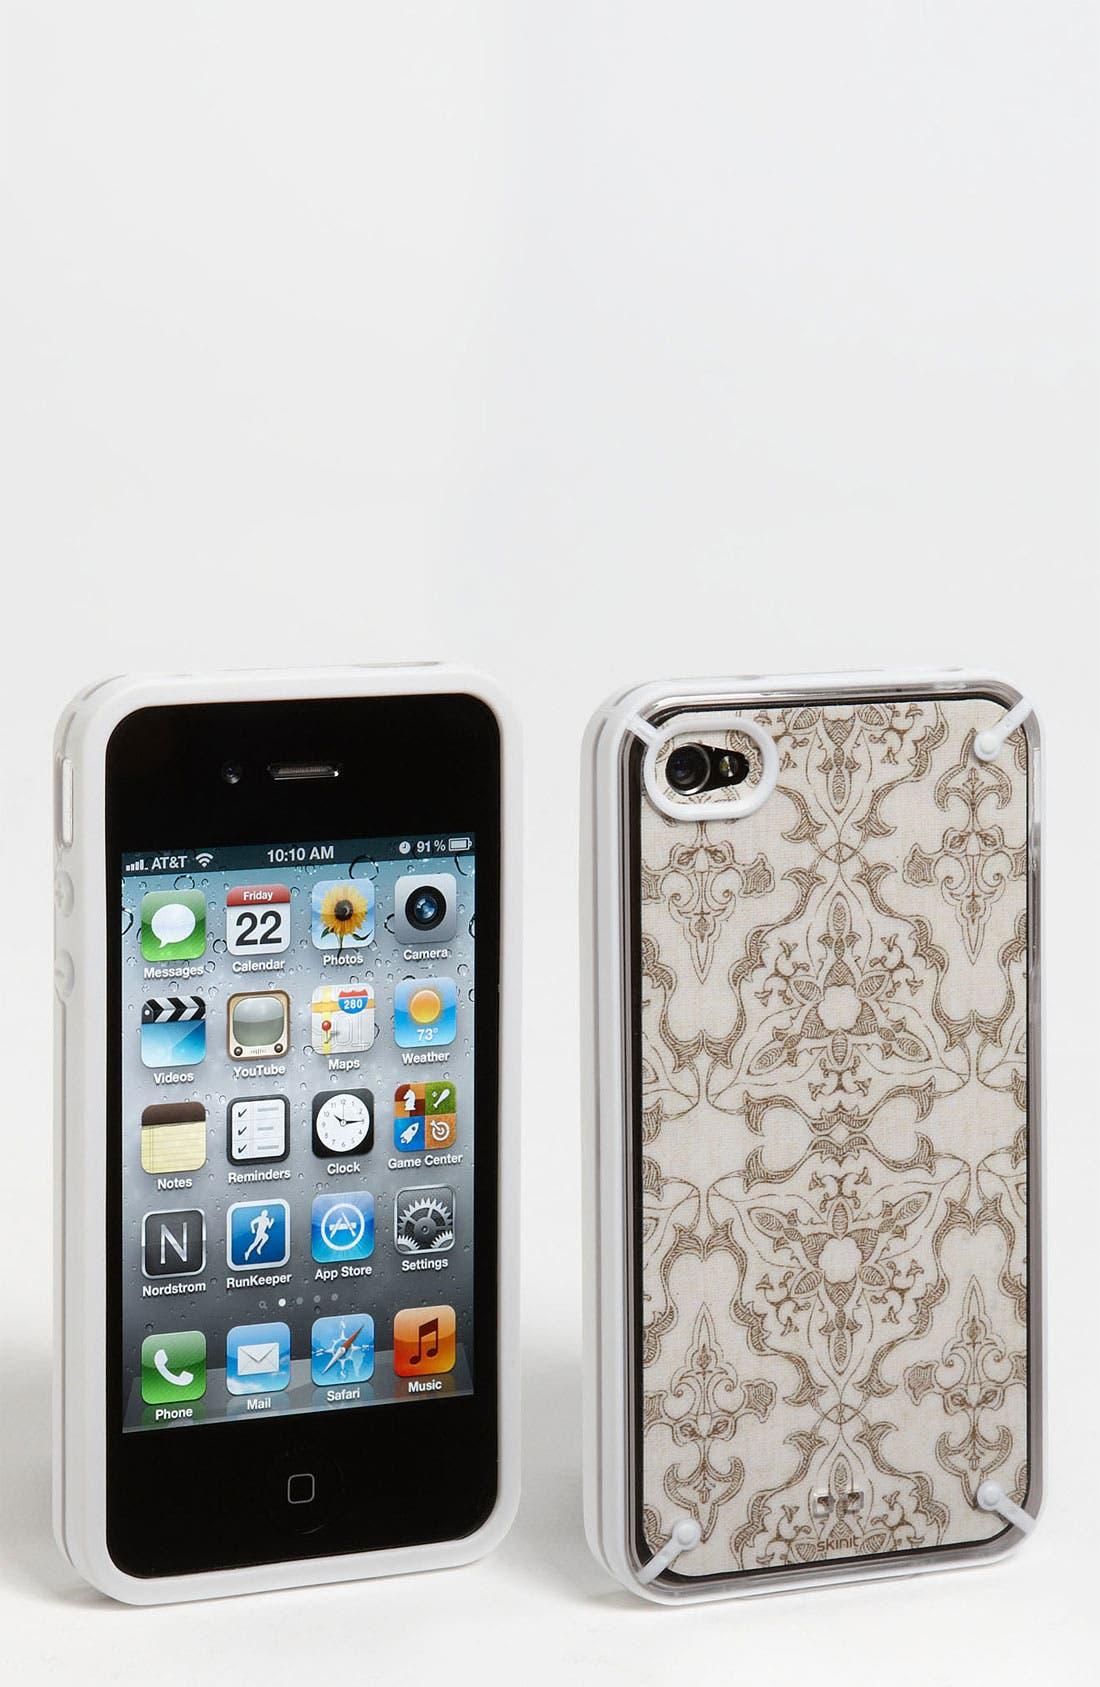 Alternate Image 1 Selected - Skinit 'Matrix Tough' iPhone 4 & 4S Case